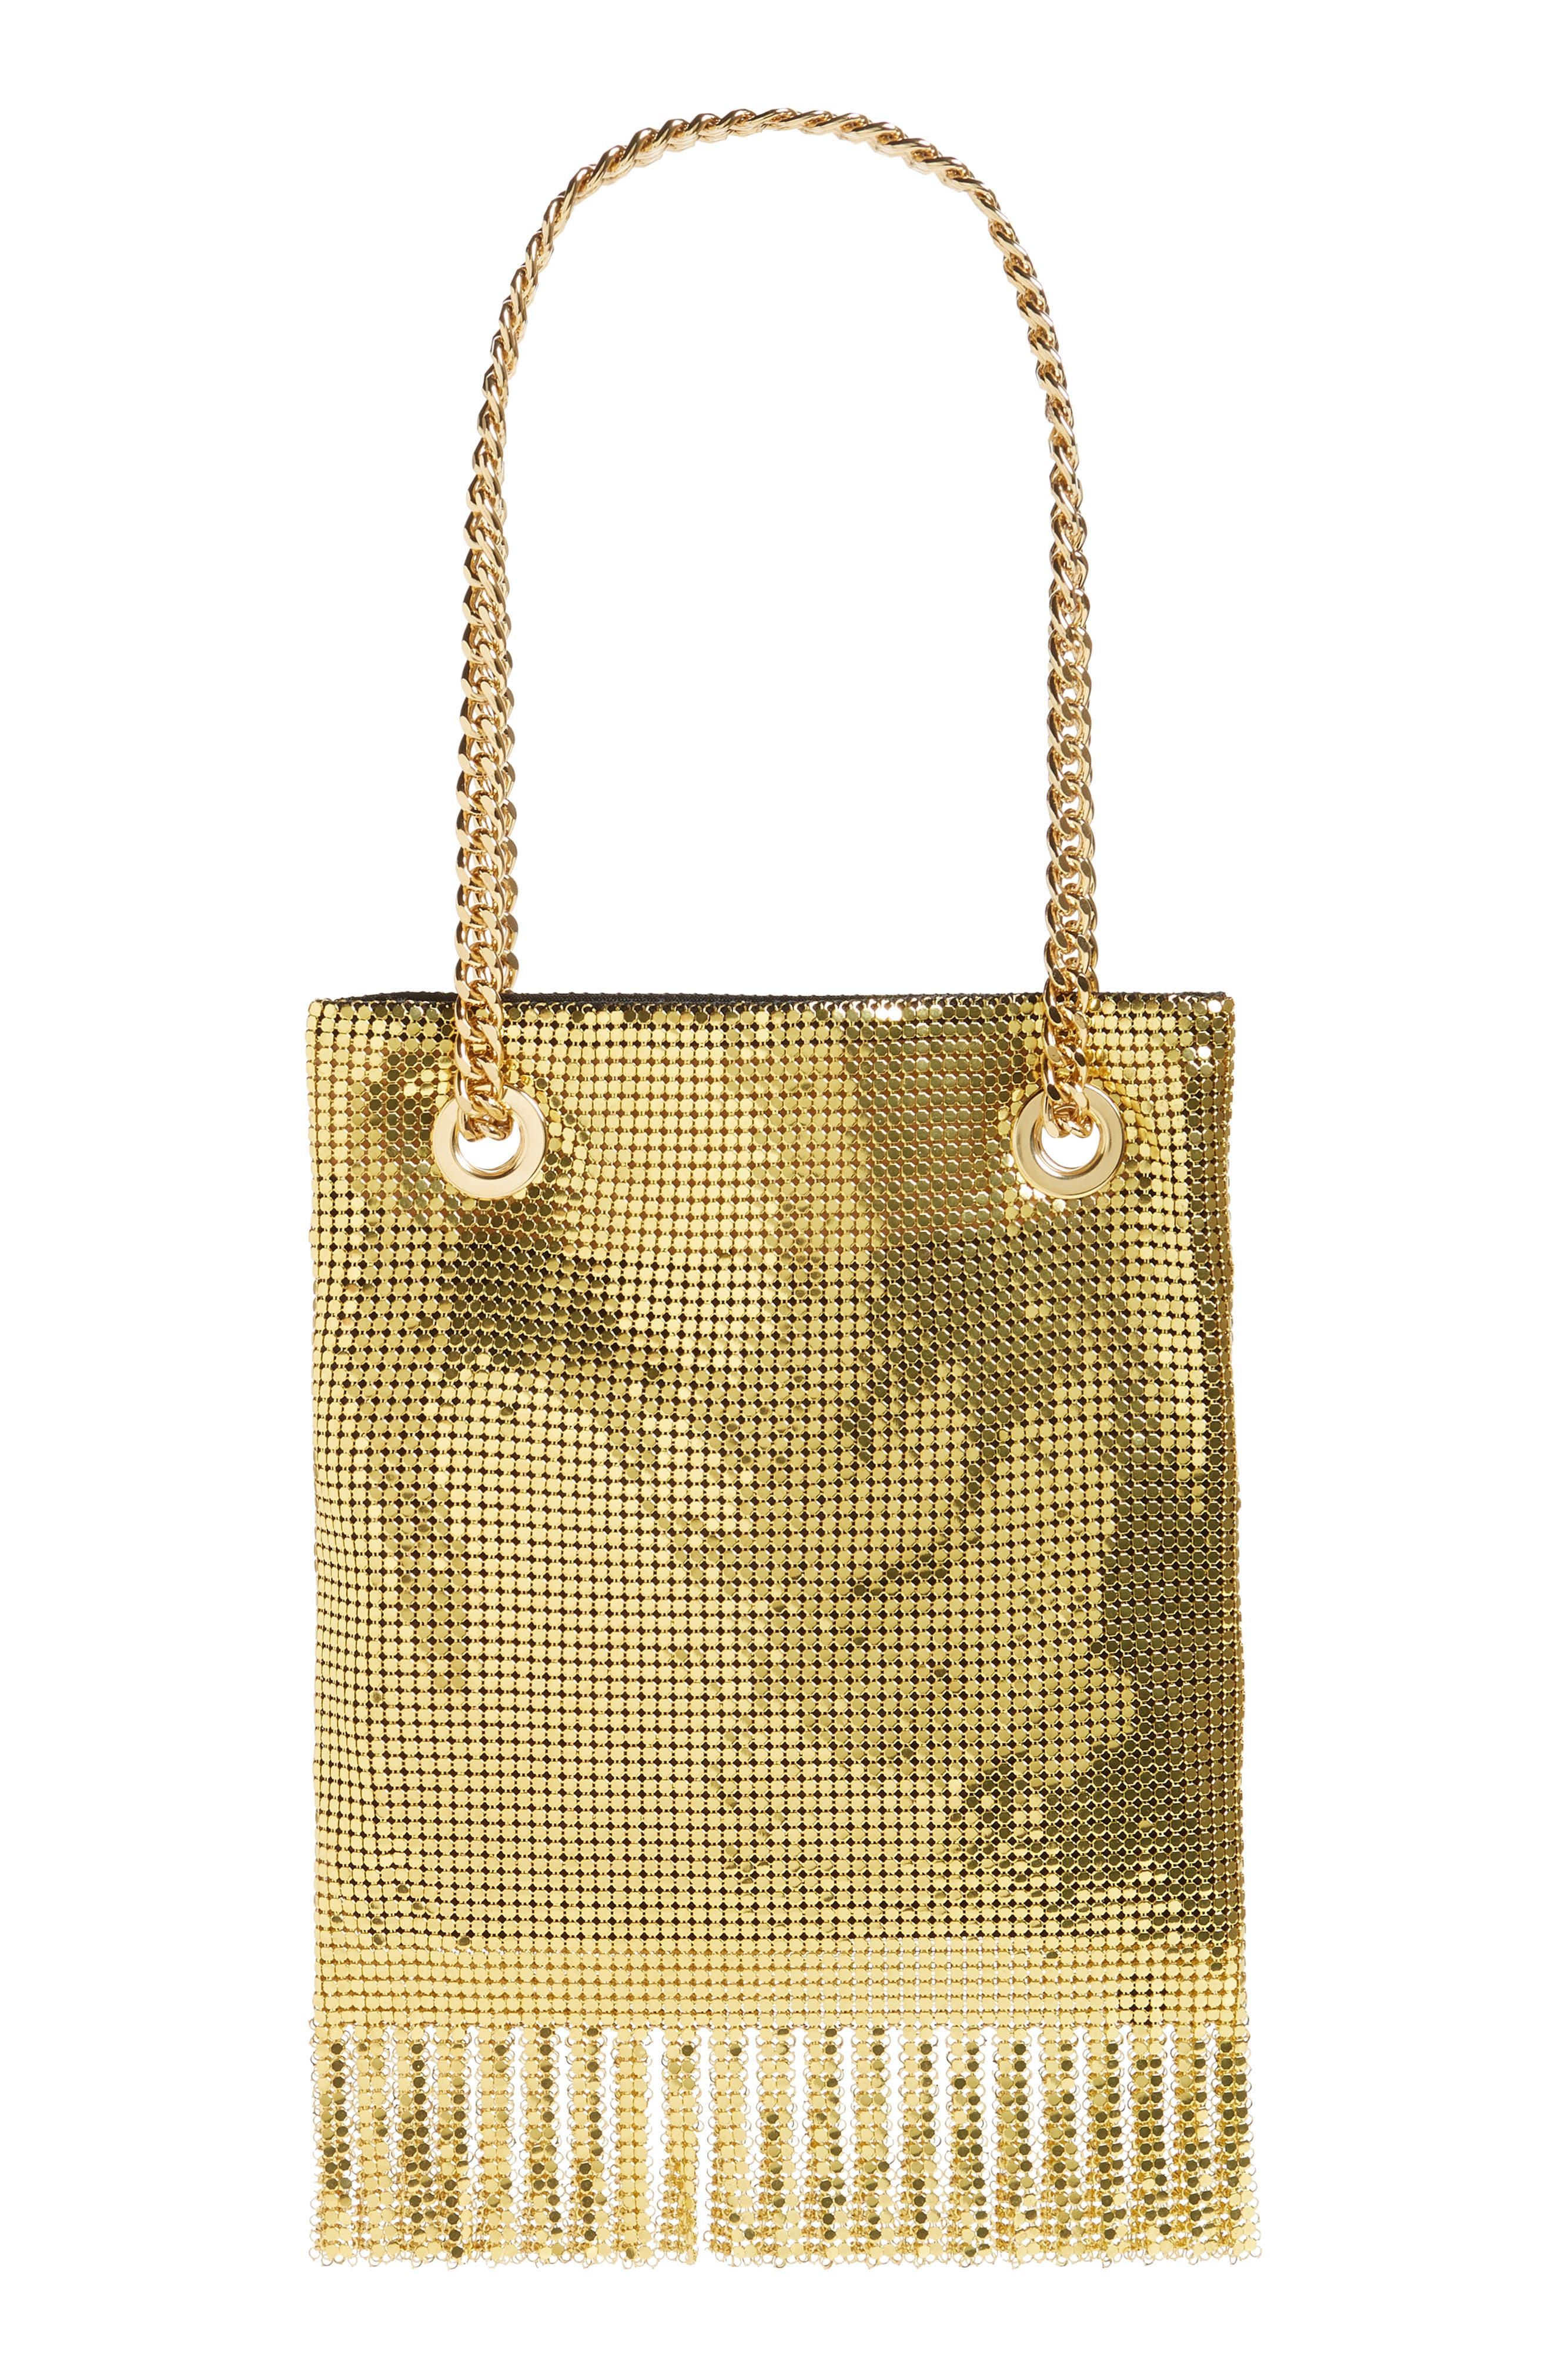 MOSCHINO, Logo Metallic Mesh Fringe Bag, Alternate thumbnail 4, color, GOLD